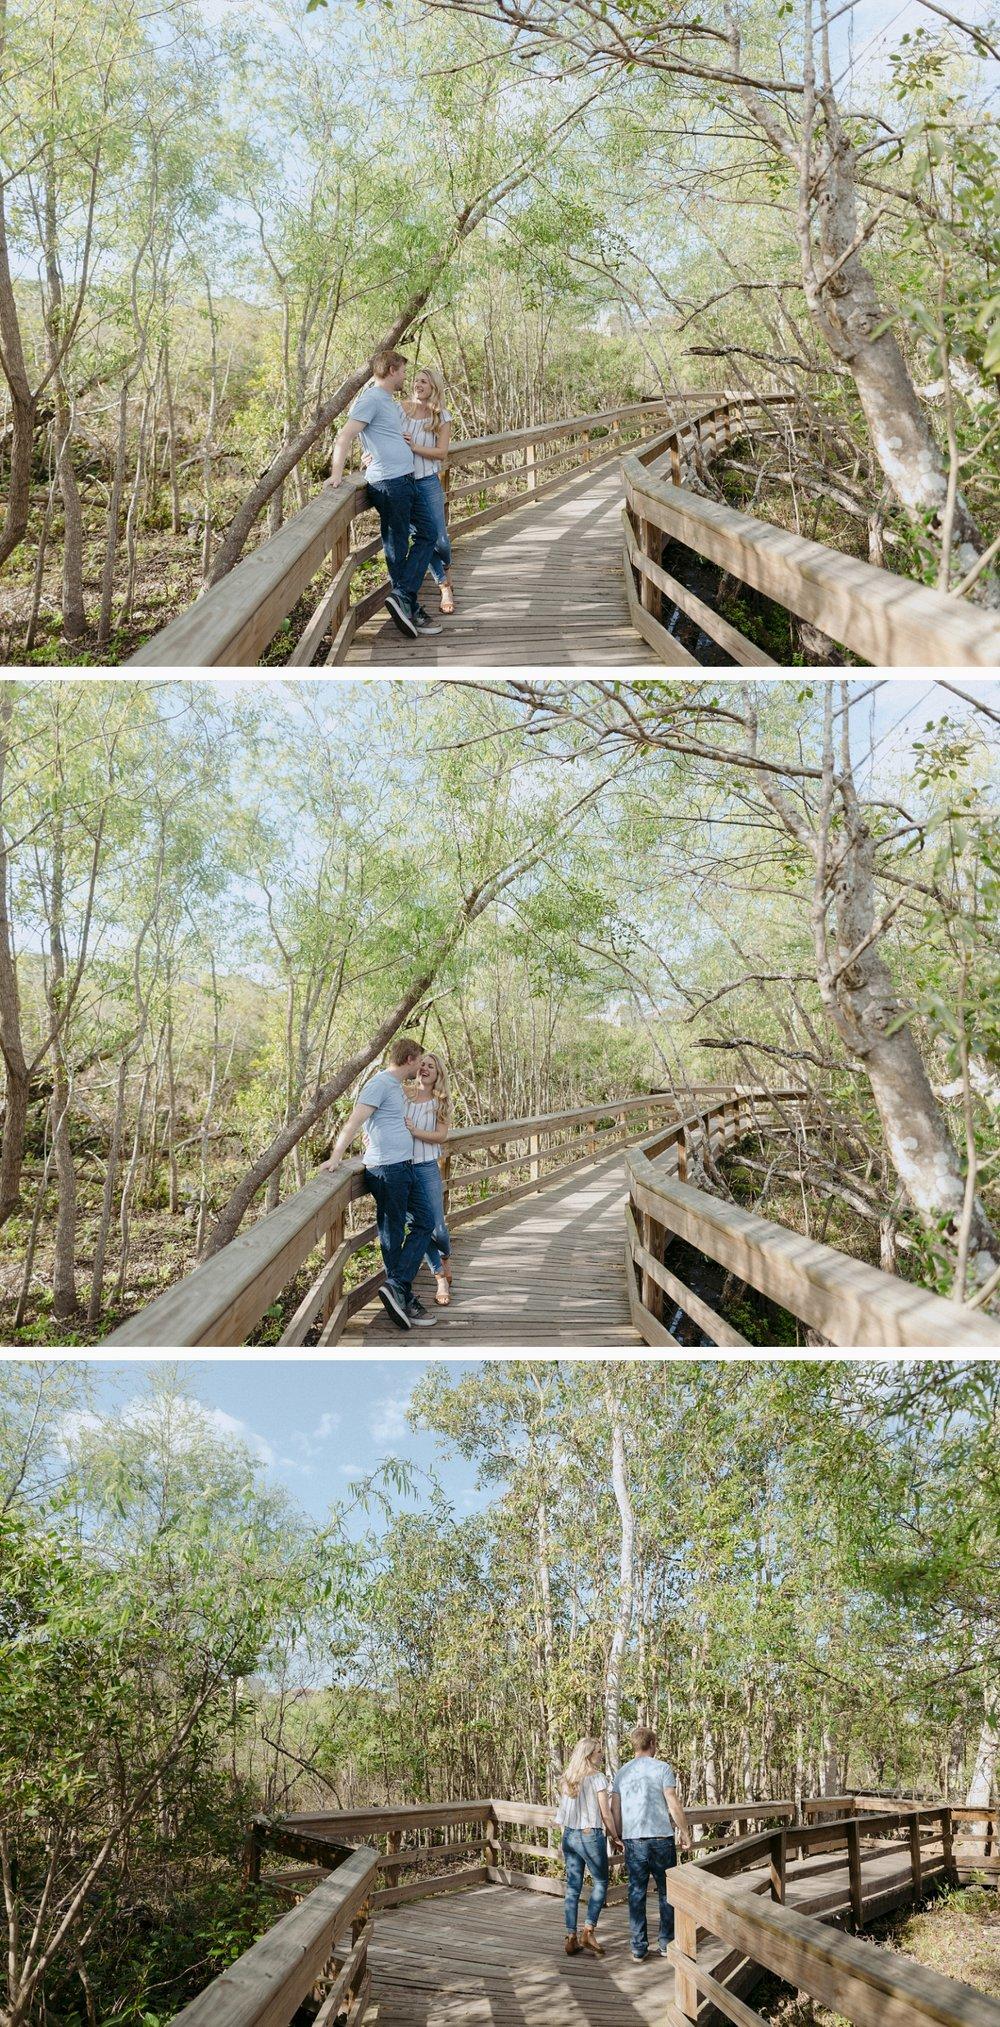 Kylie-And-Jack-Mead-Botanical-Garden-Engagement_0012.jpg